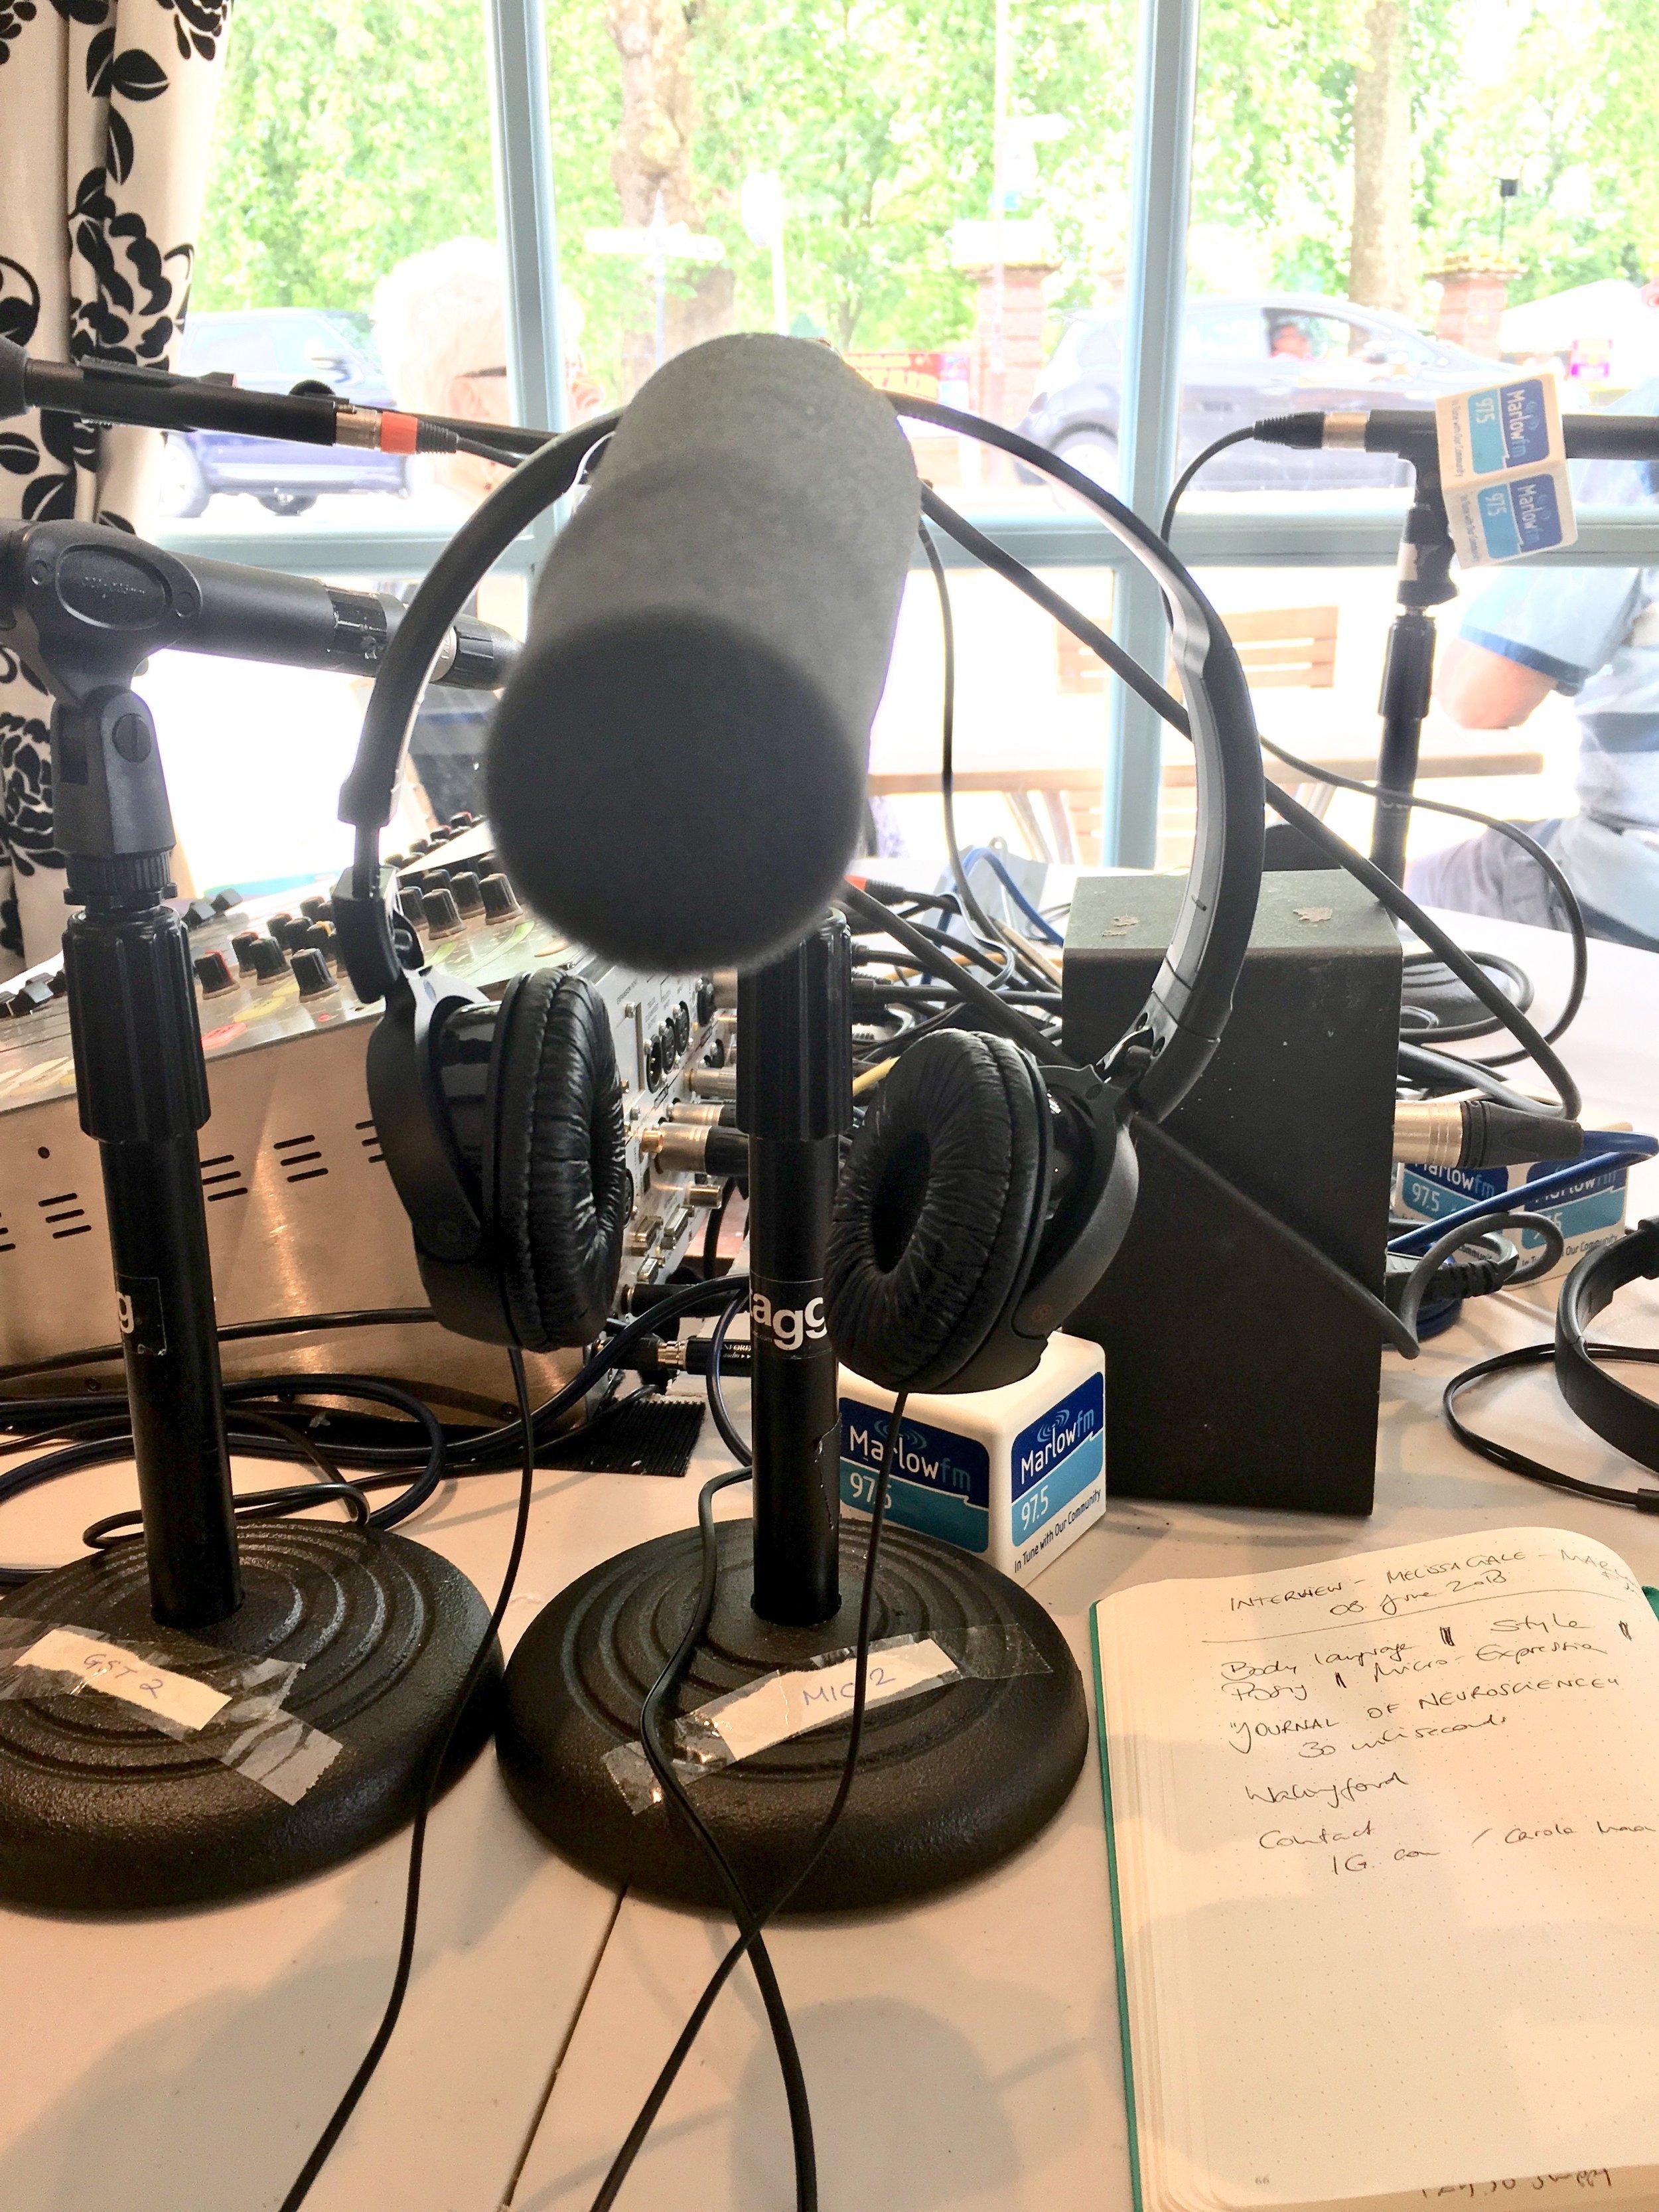 Carola Moon at MarlowFM's The Buzz - Radio Interview with Melissa Gale 2.jpg